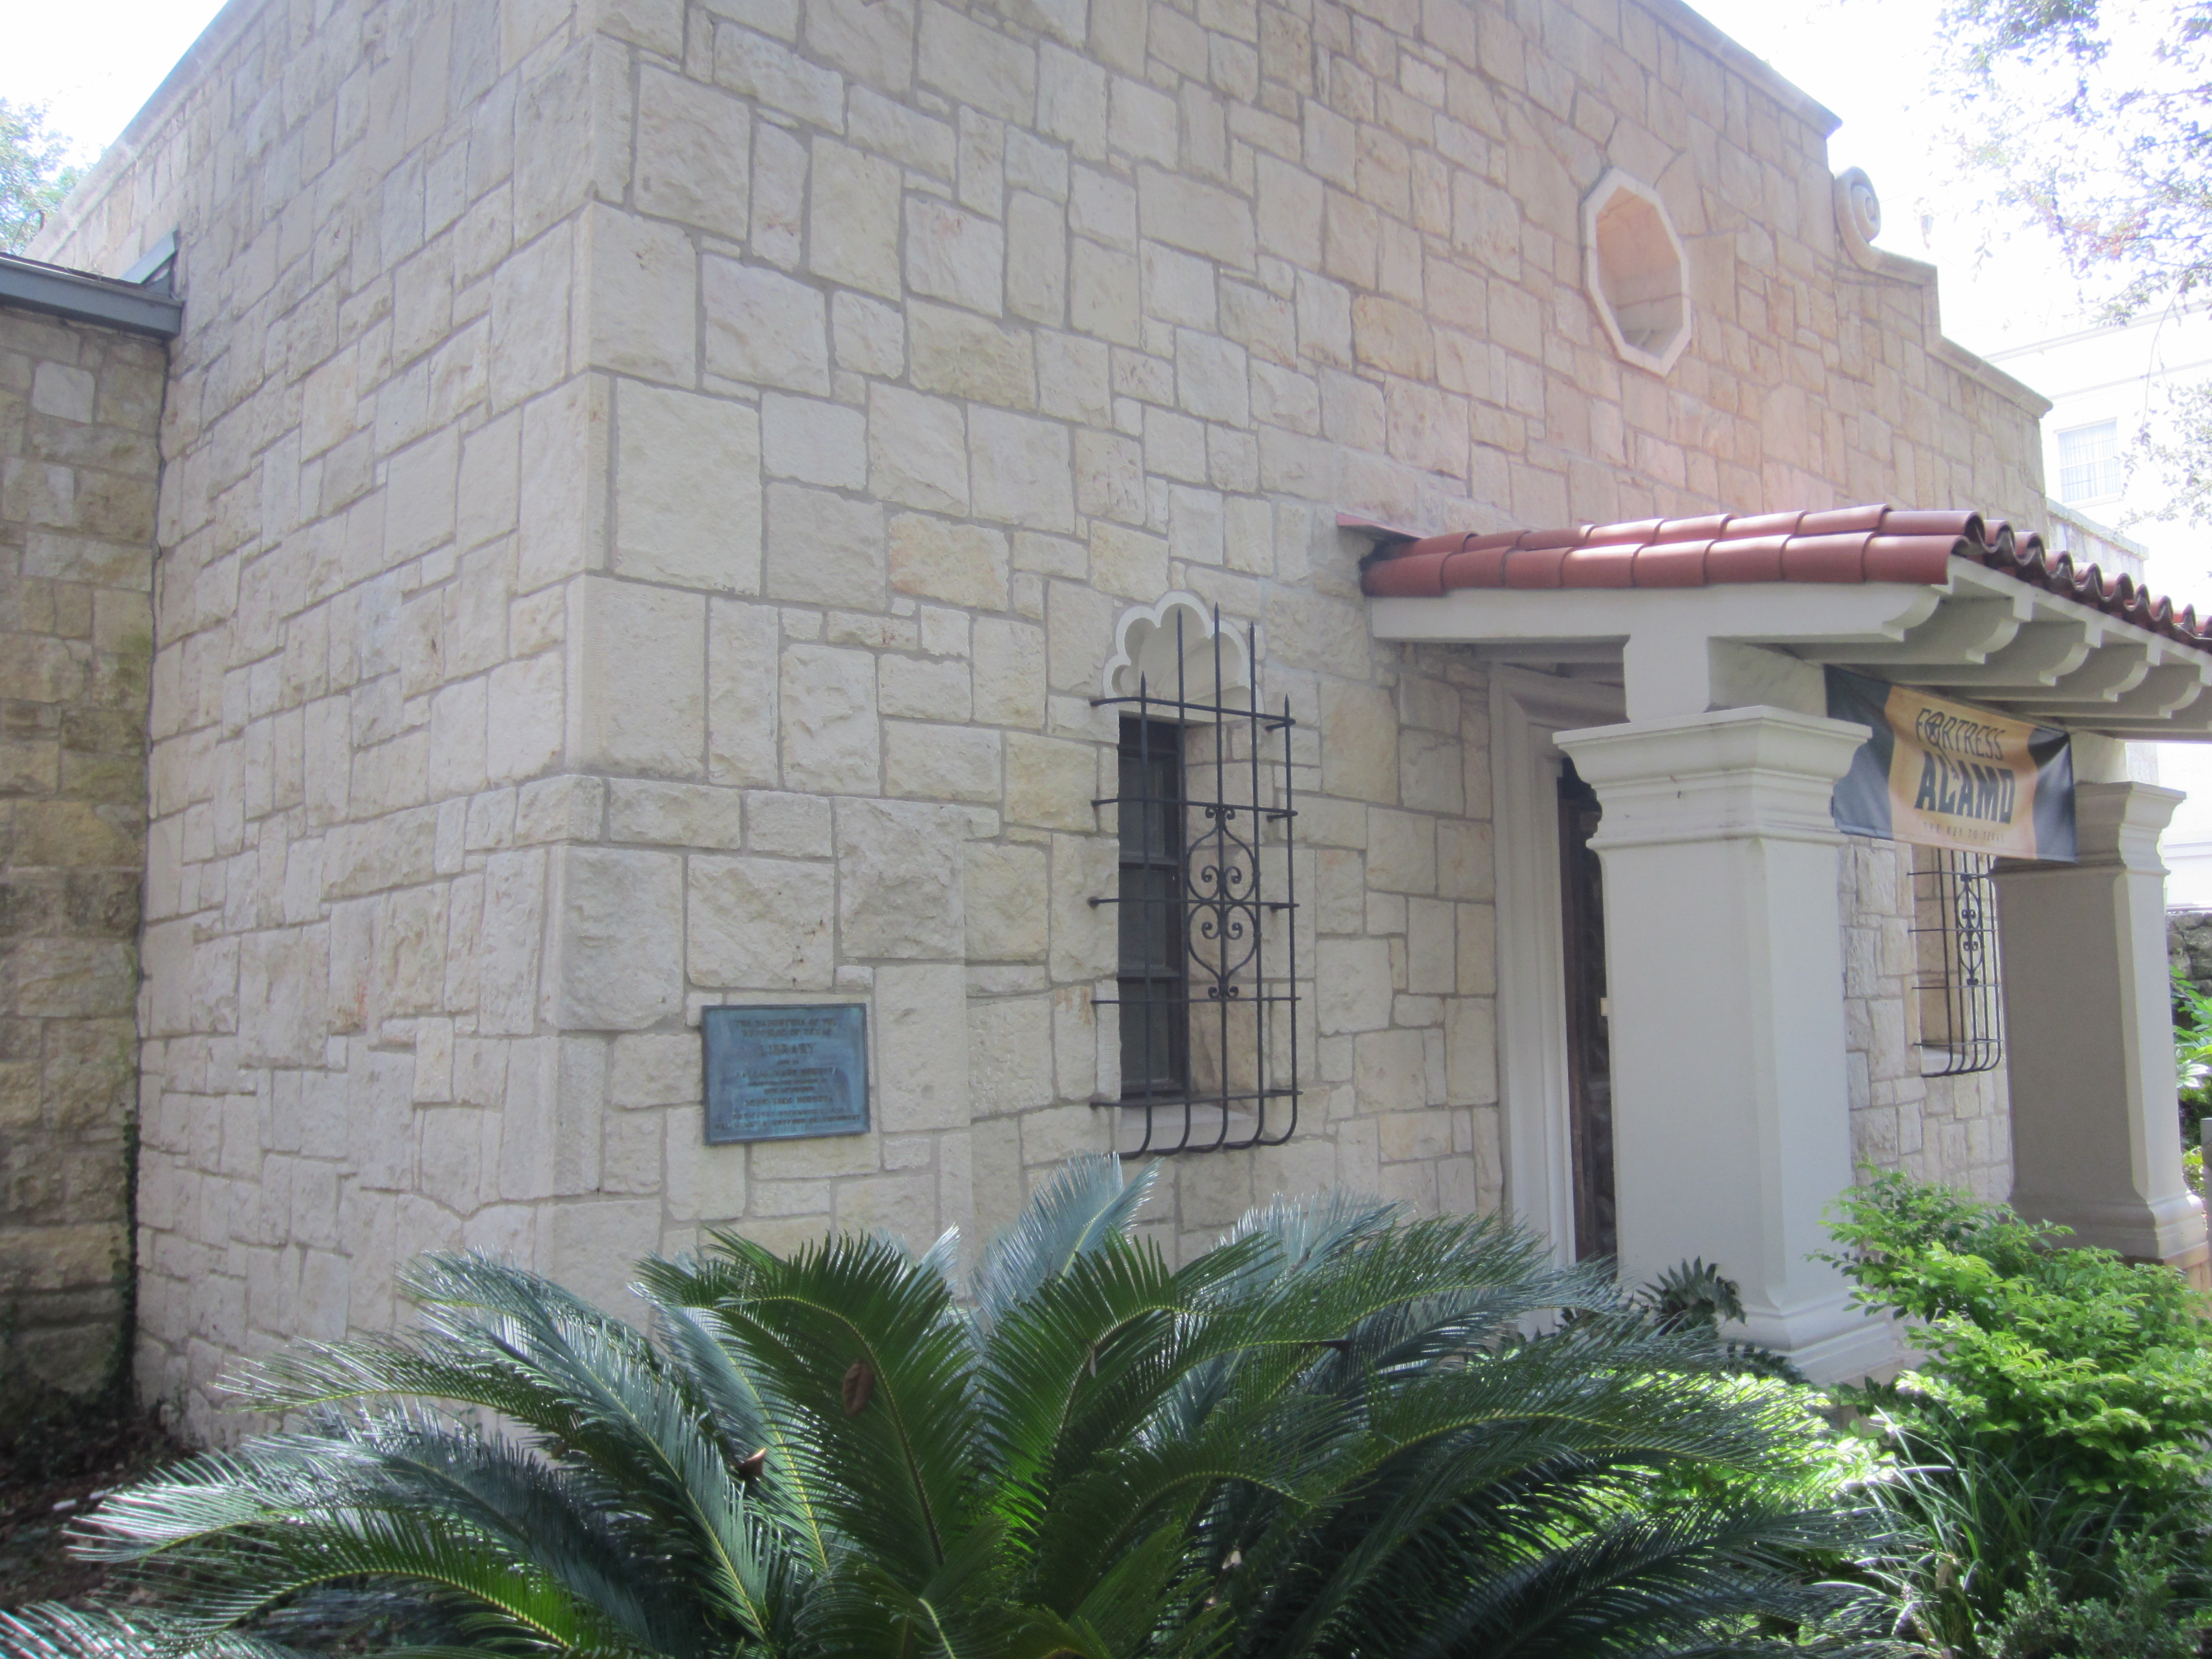 The Alamo in San Antonio, Texas   Historic Places